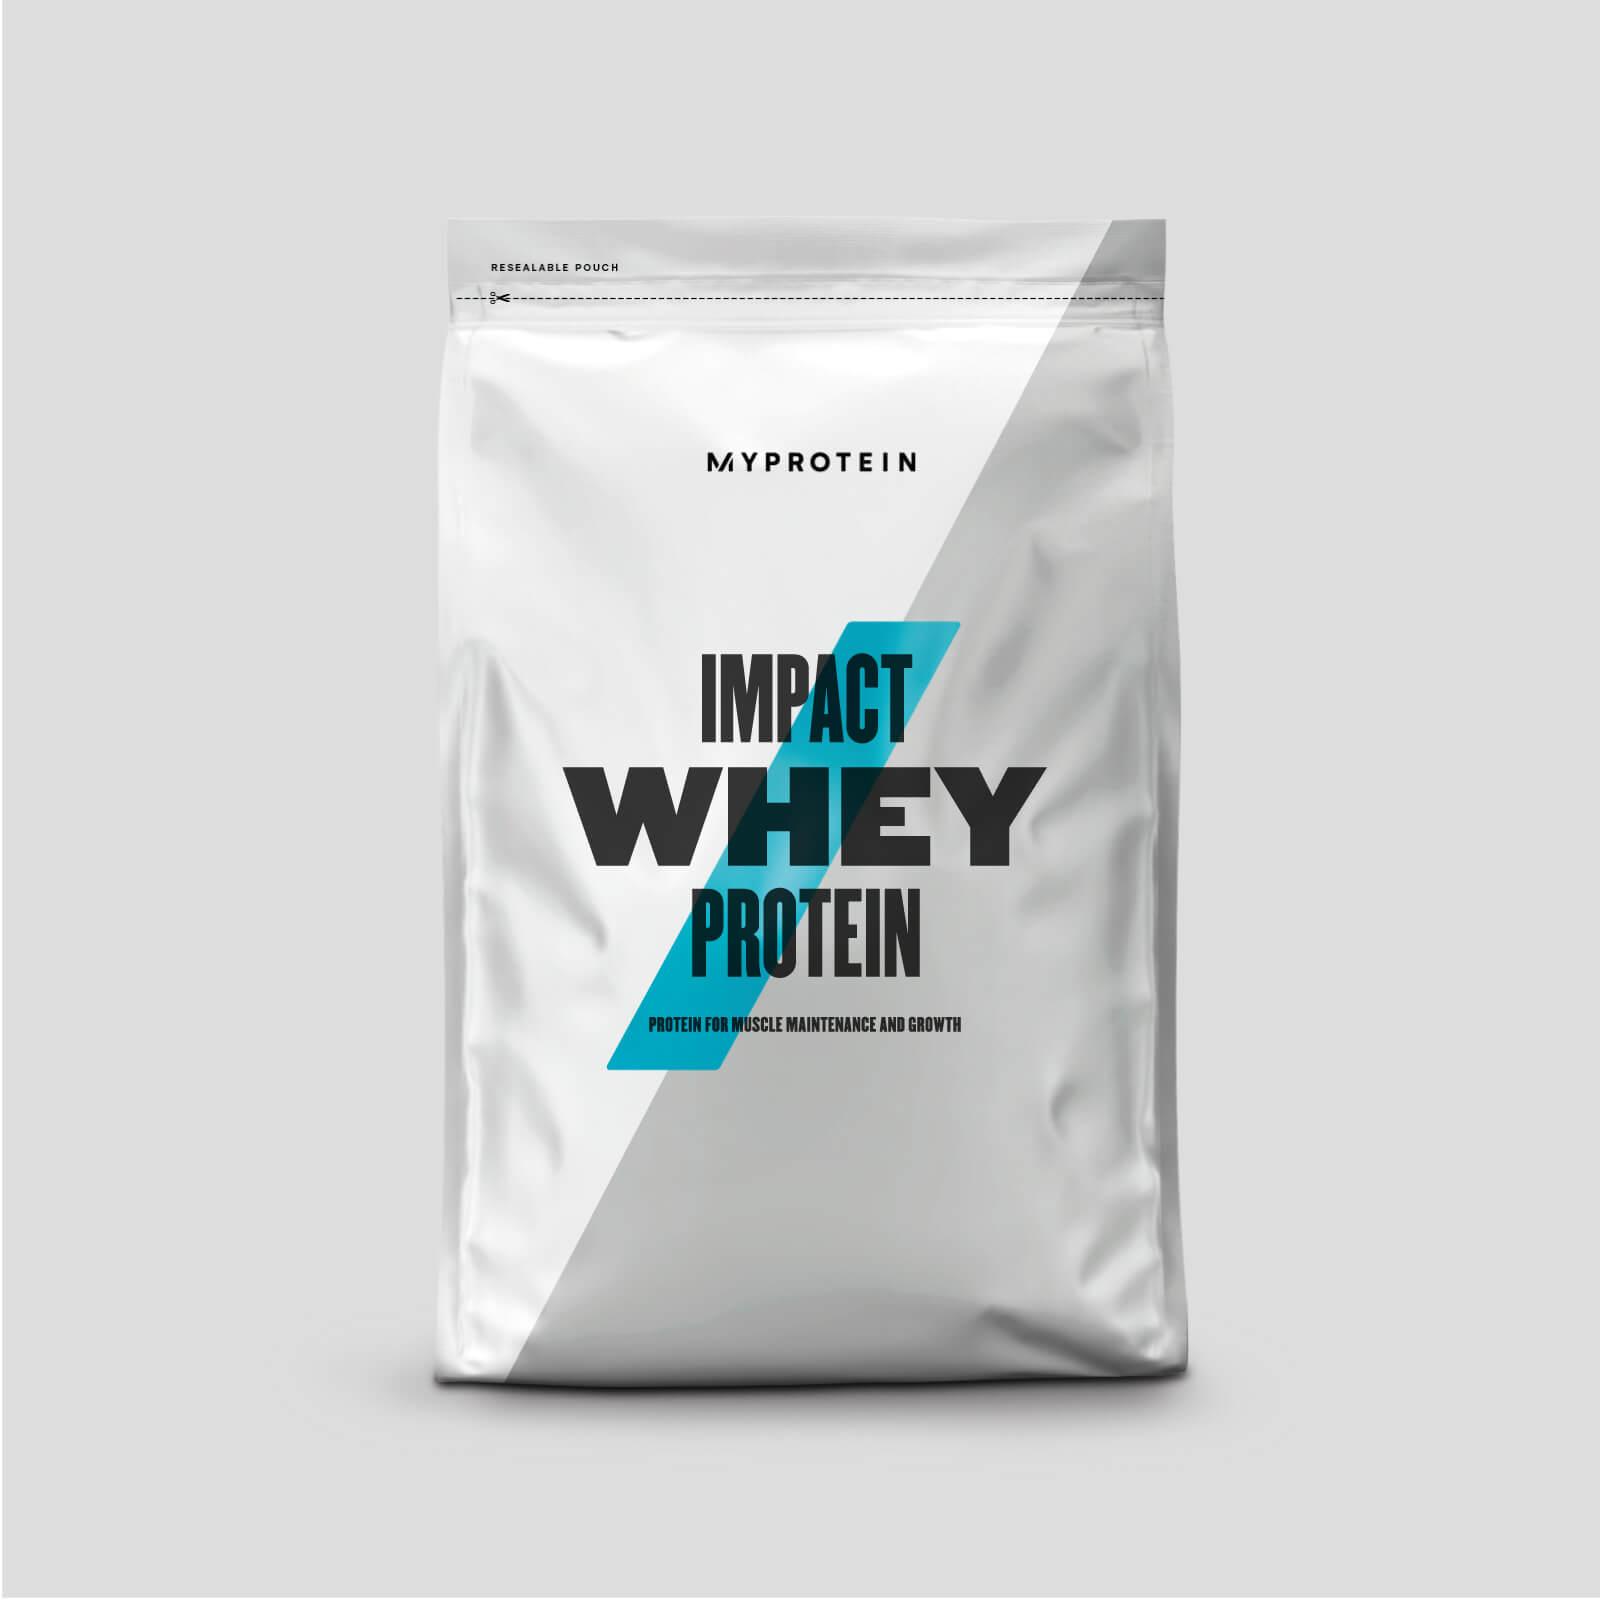 Myprotein Impact Whey Protein - 1kg - Limited Edition Mango